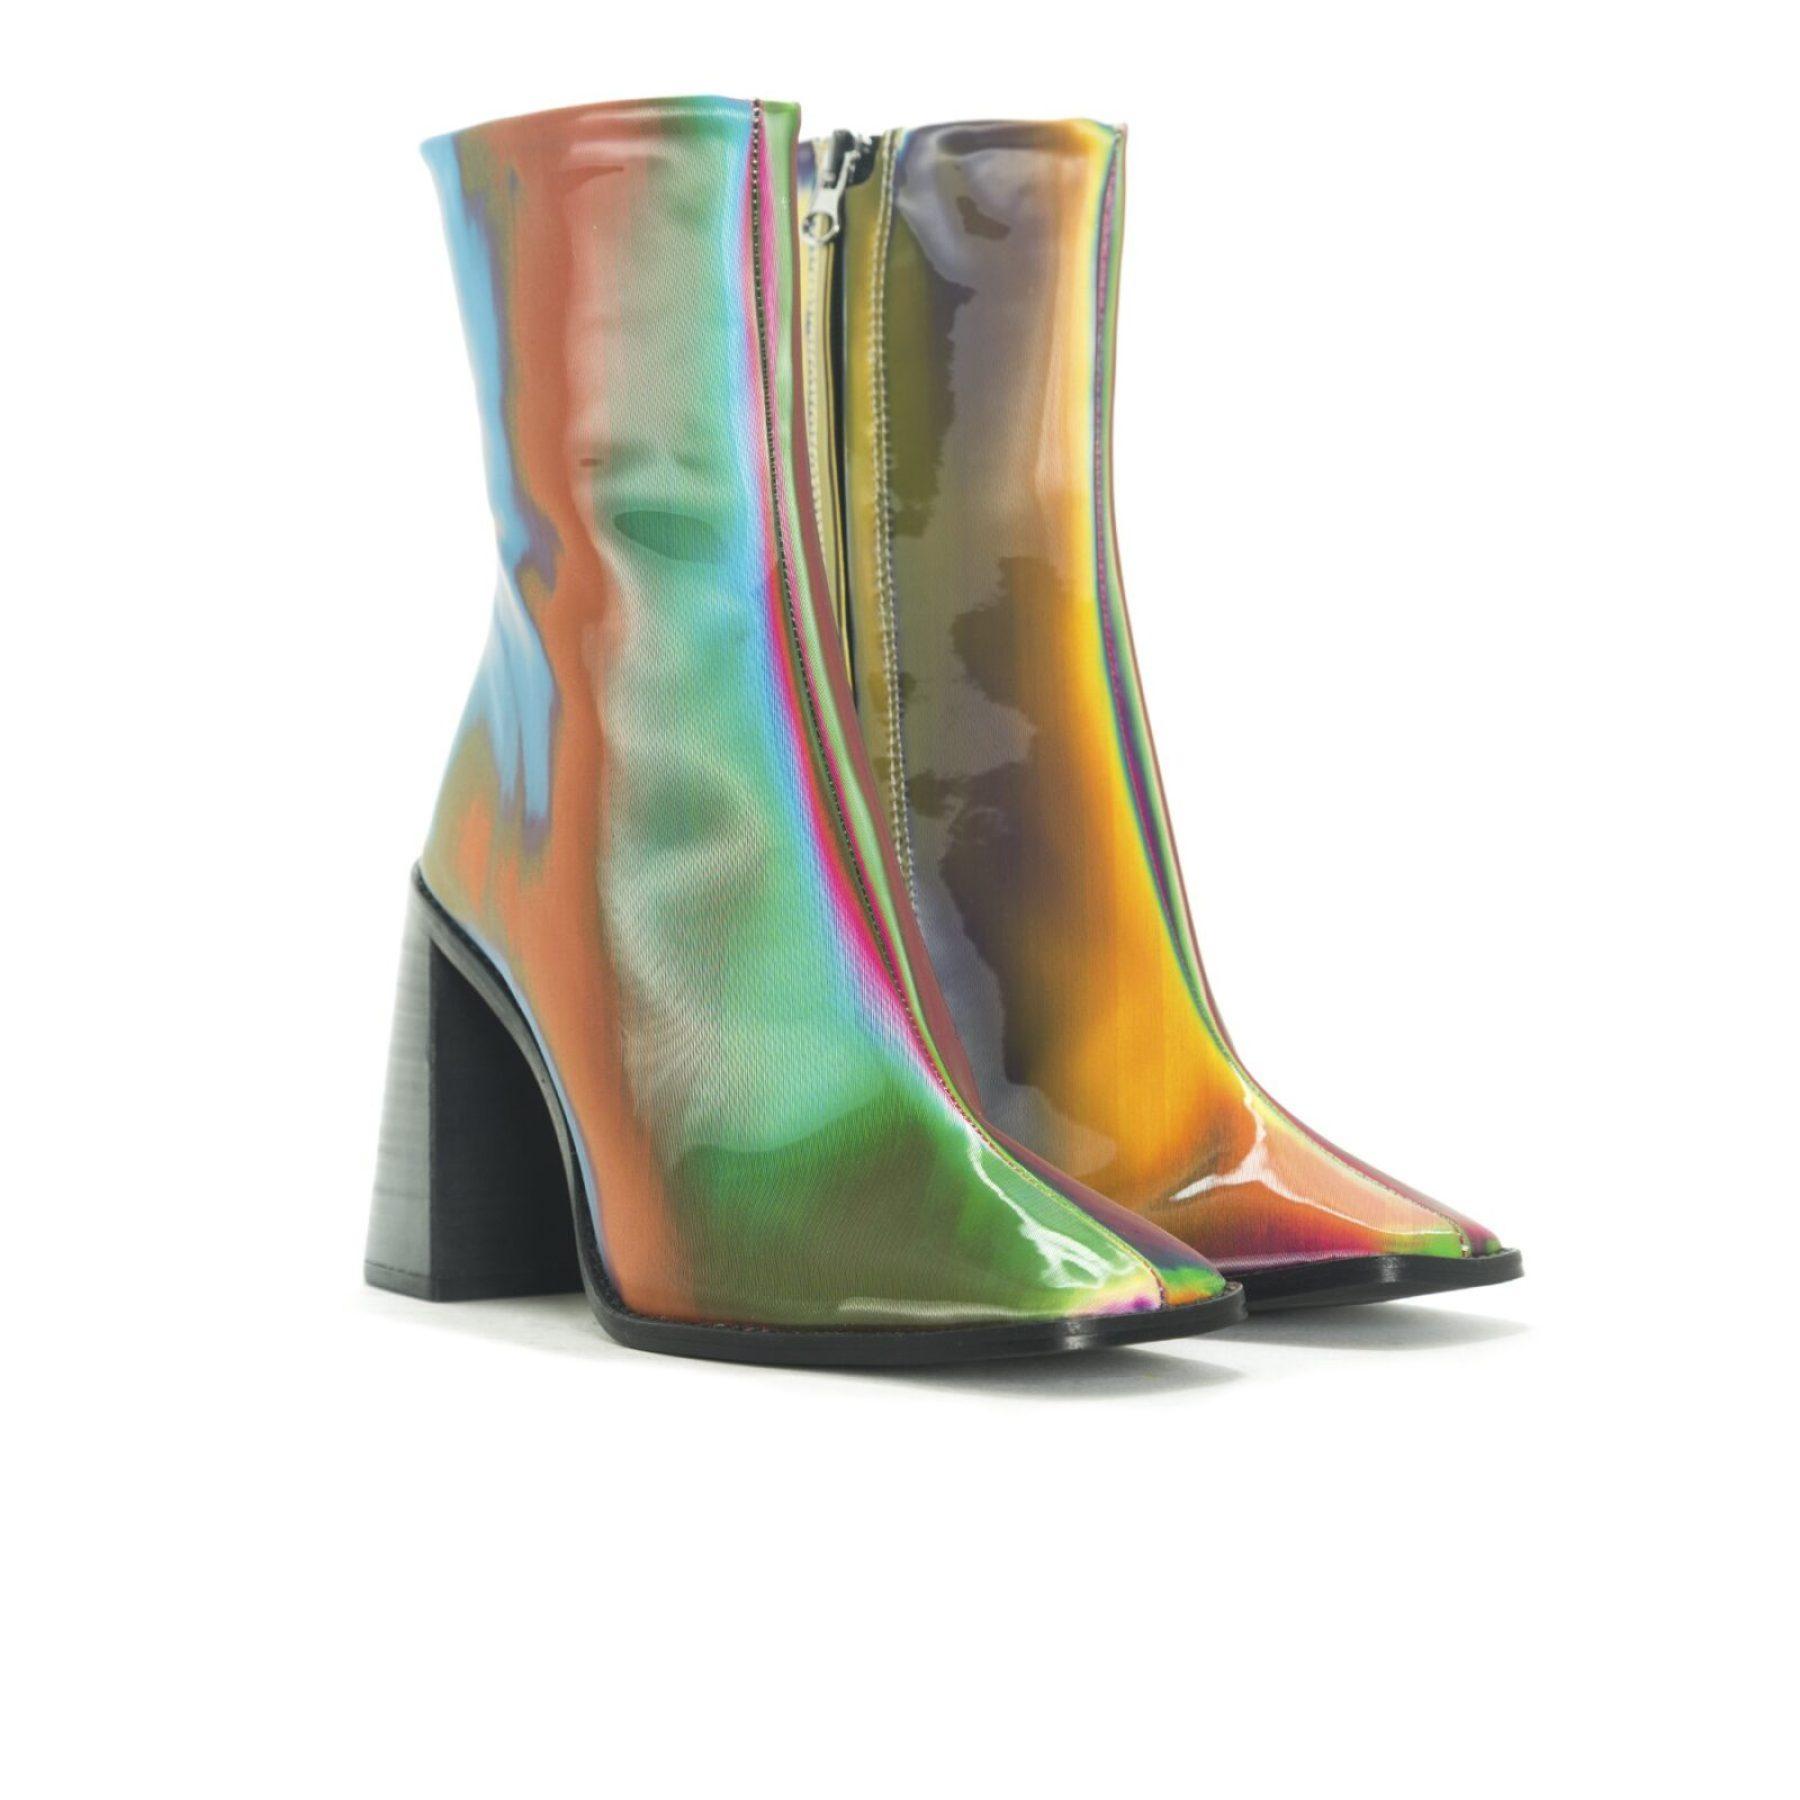 L'intervalle Belmar Holographic Boots